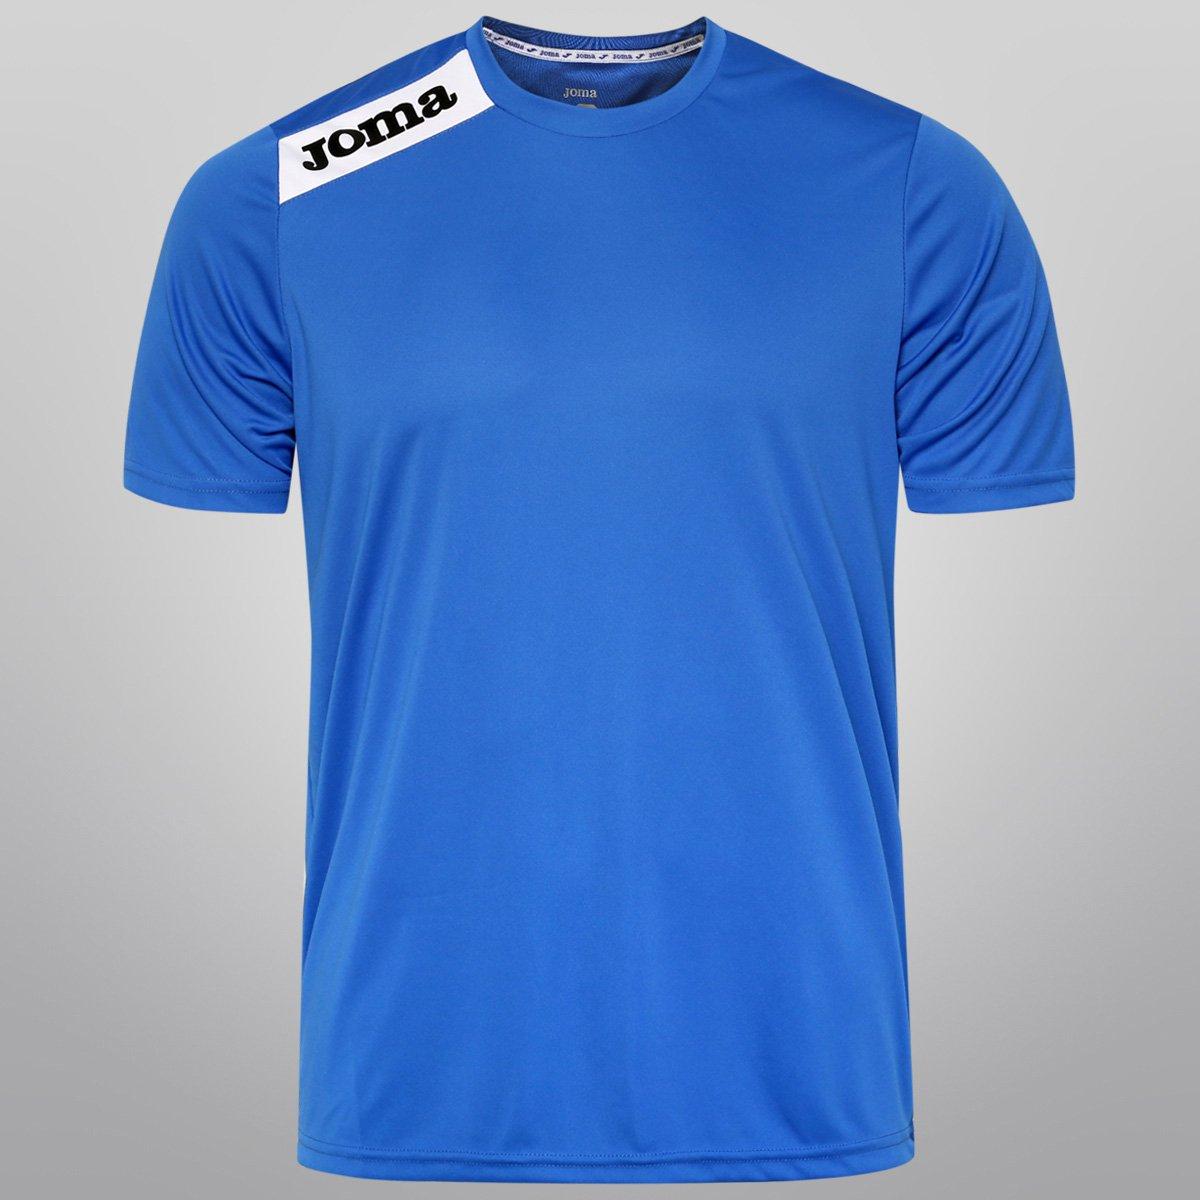 c62f748d29 Camiseta Joma Victory - Compre Agora